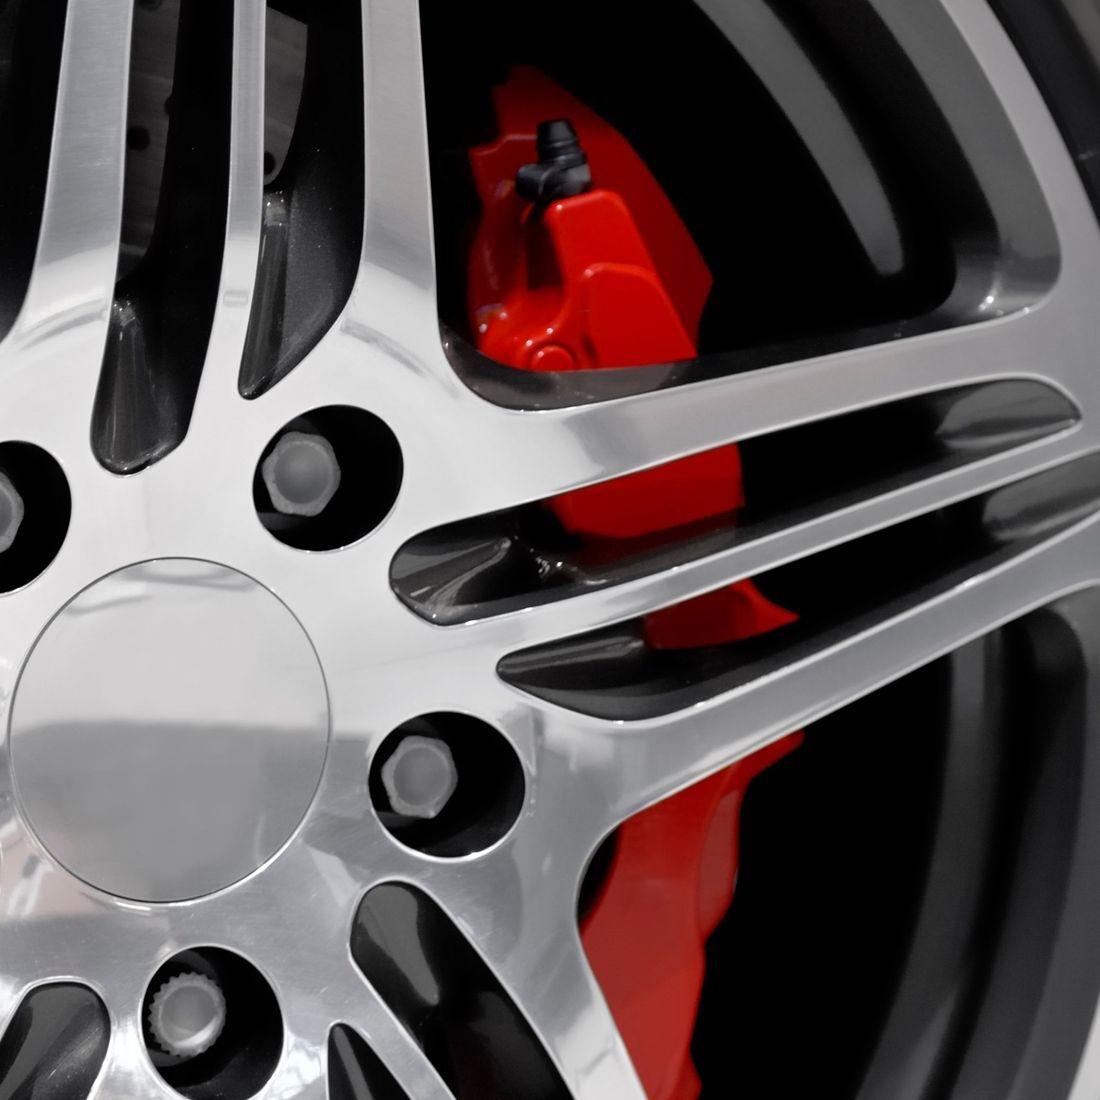 Wheel and Brake Calliper